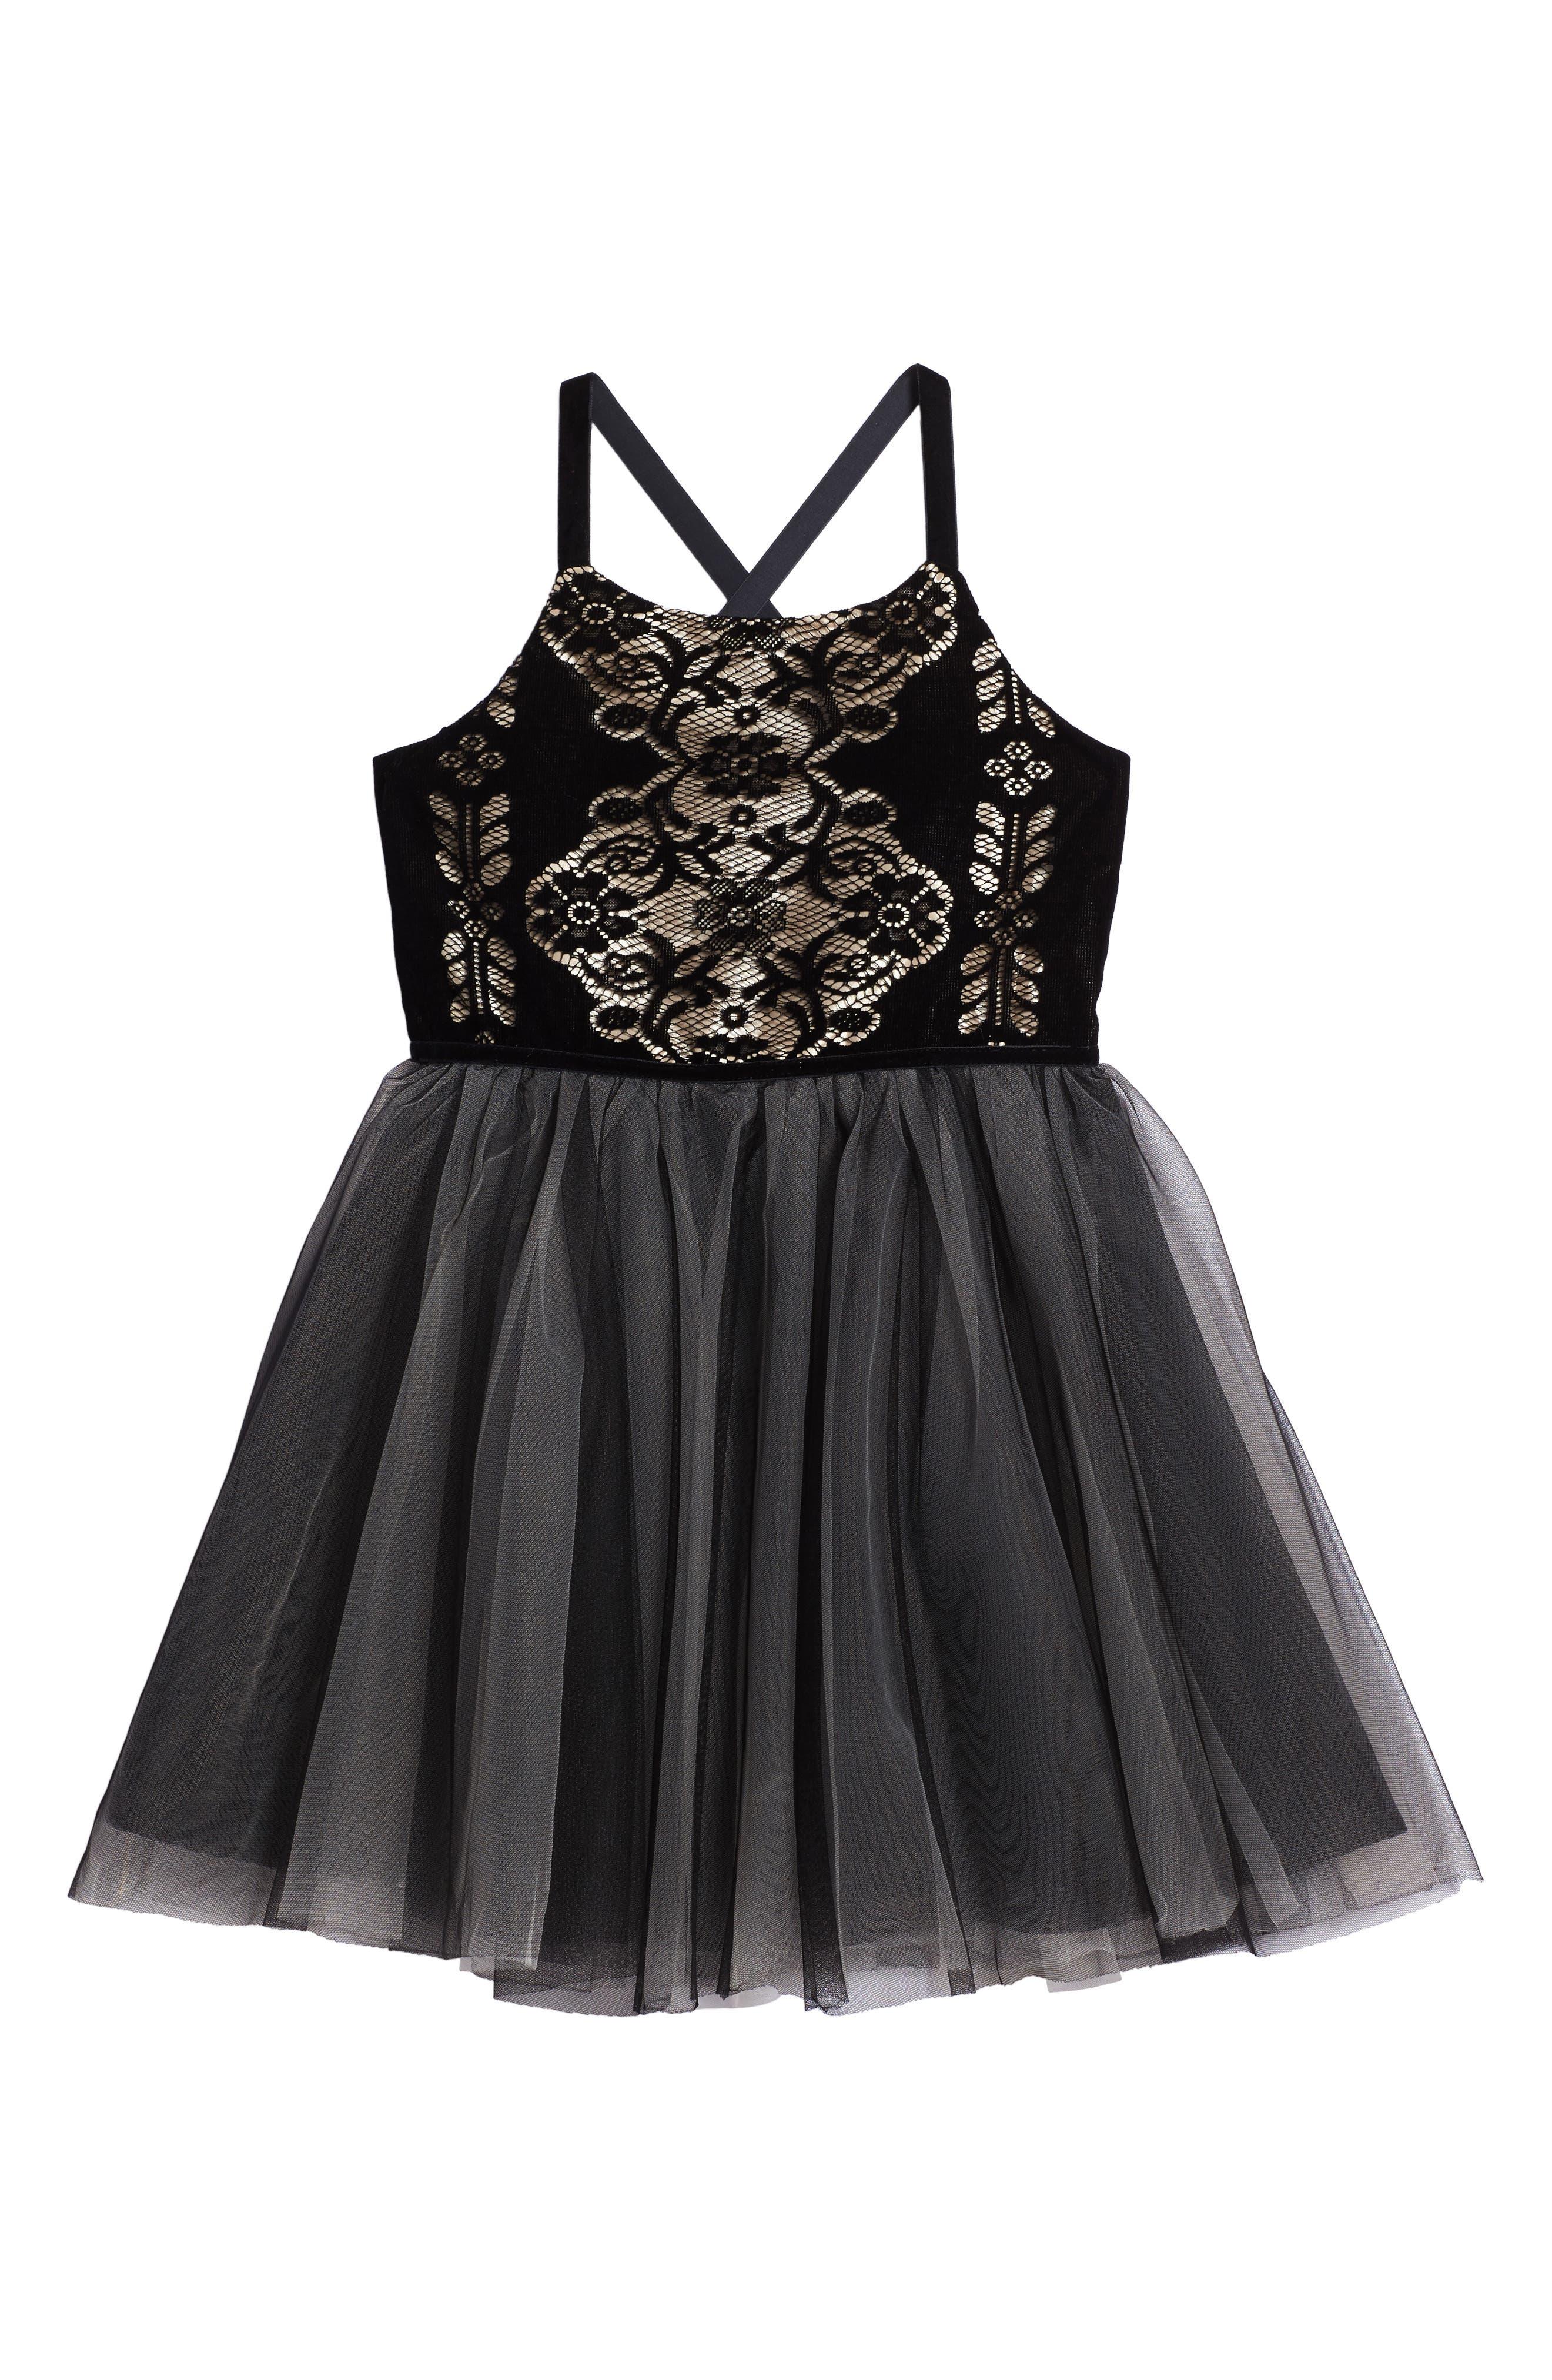 Alternate Image 1 Selected - Zunie Burnout Lace Velvet & Tulle Dress (Big Girls)